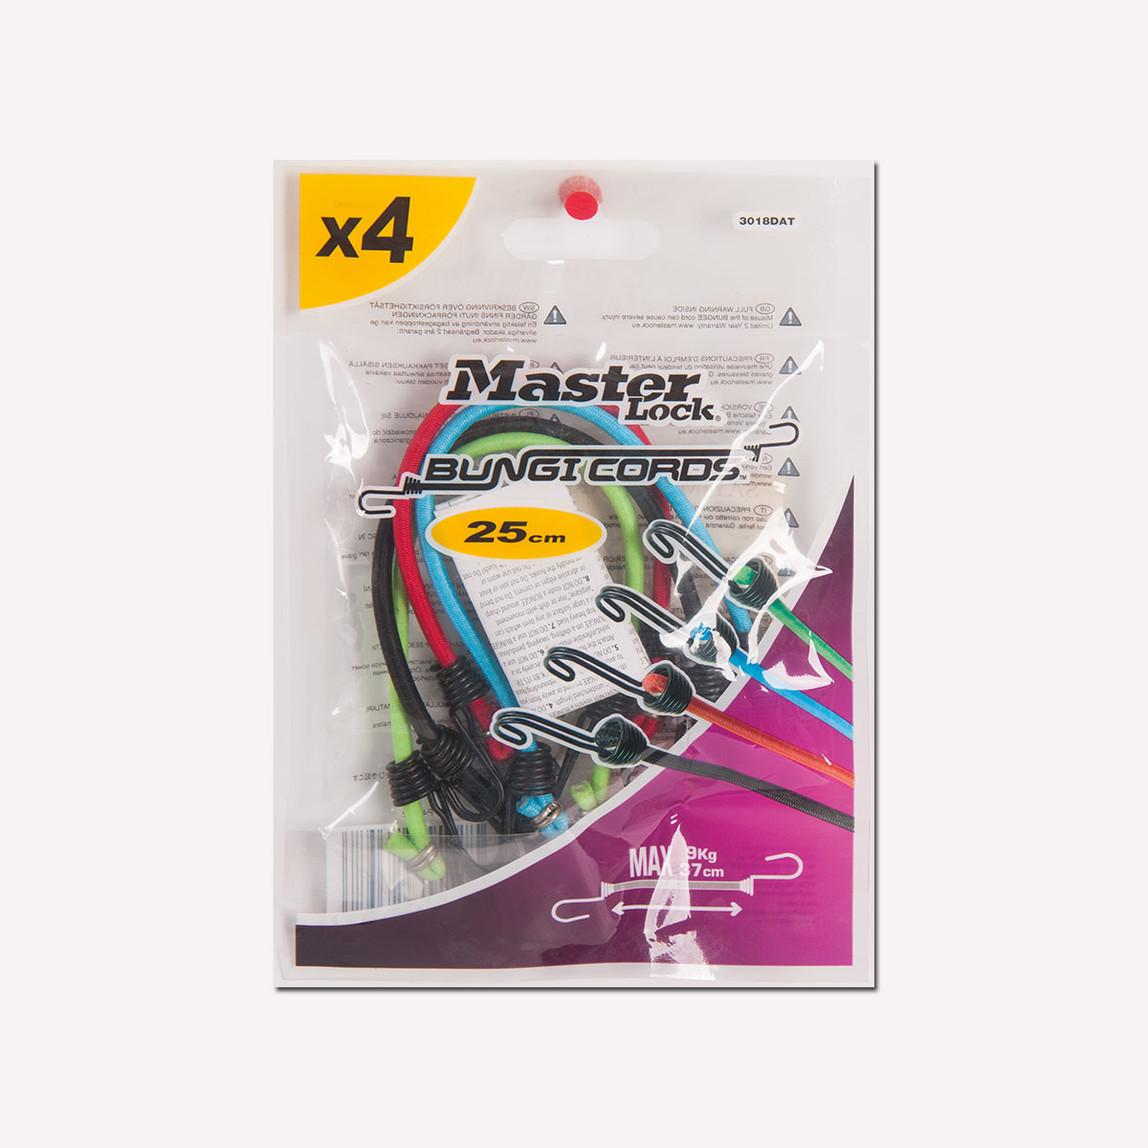 Master Lock 4'lü Bungi Cords Ahtapot Lastik